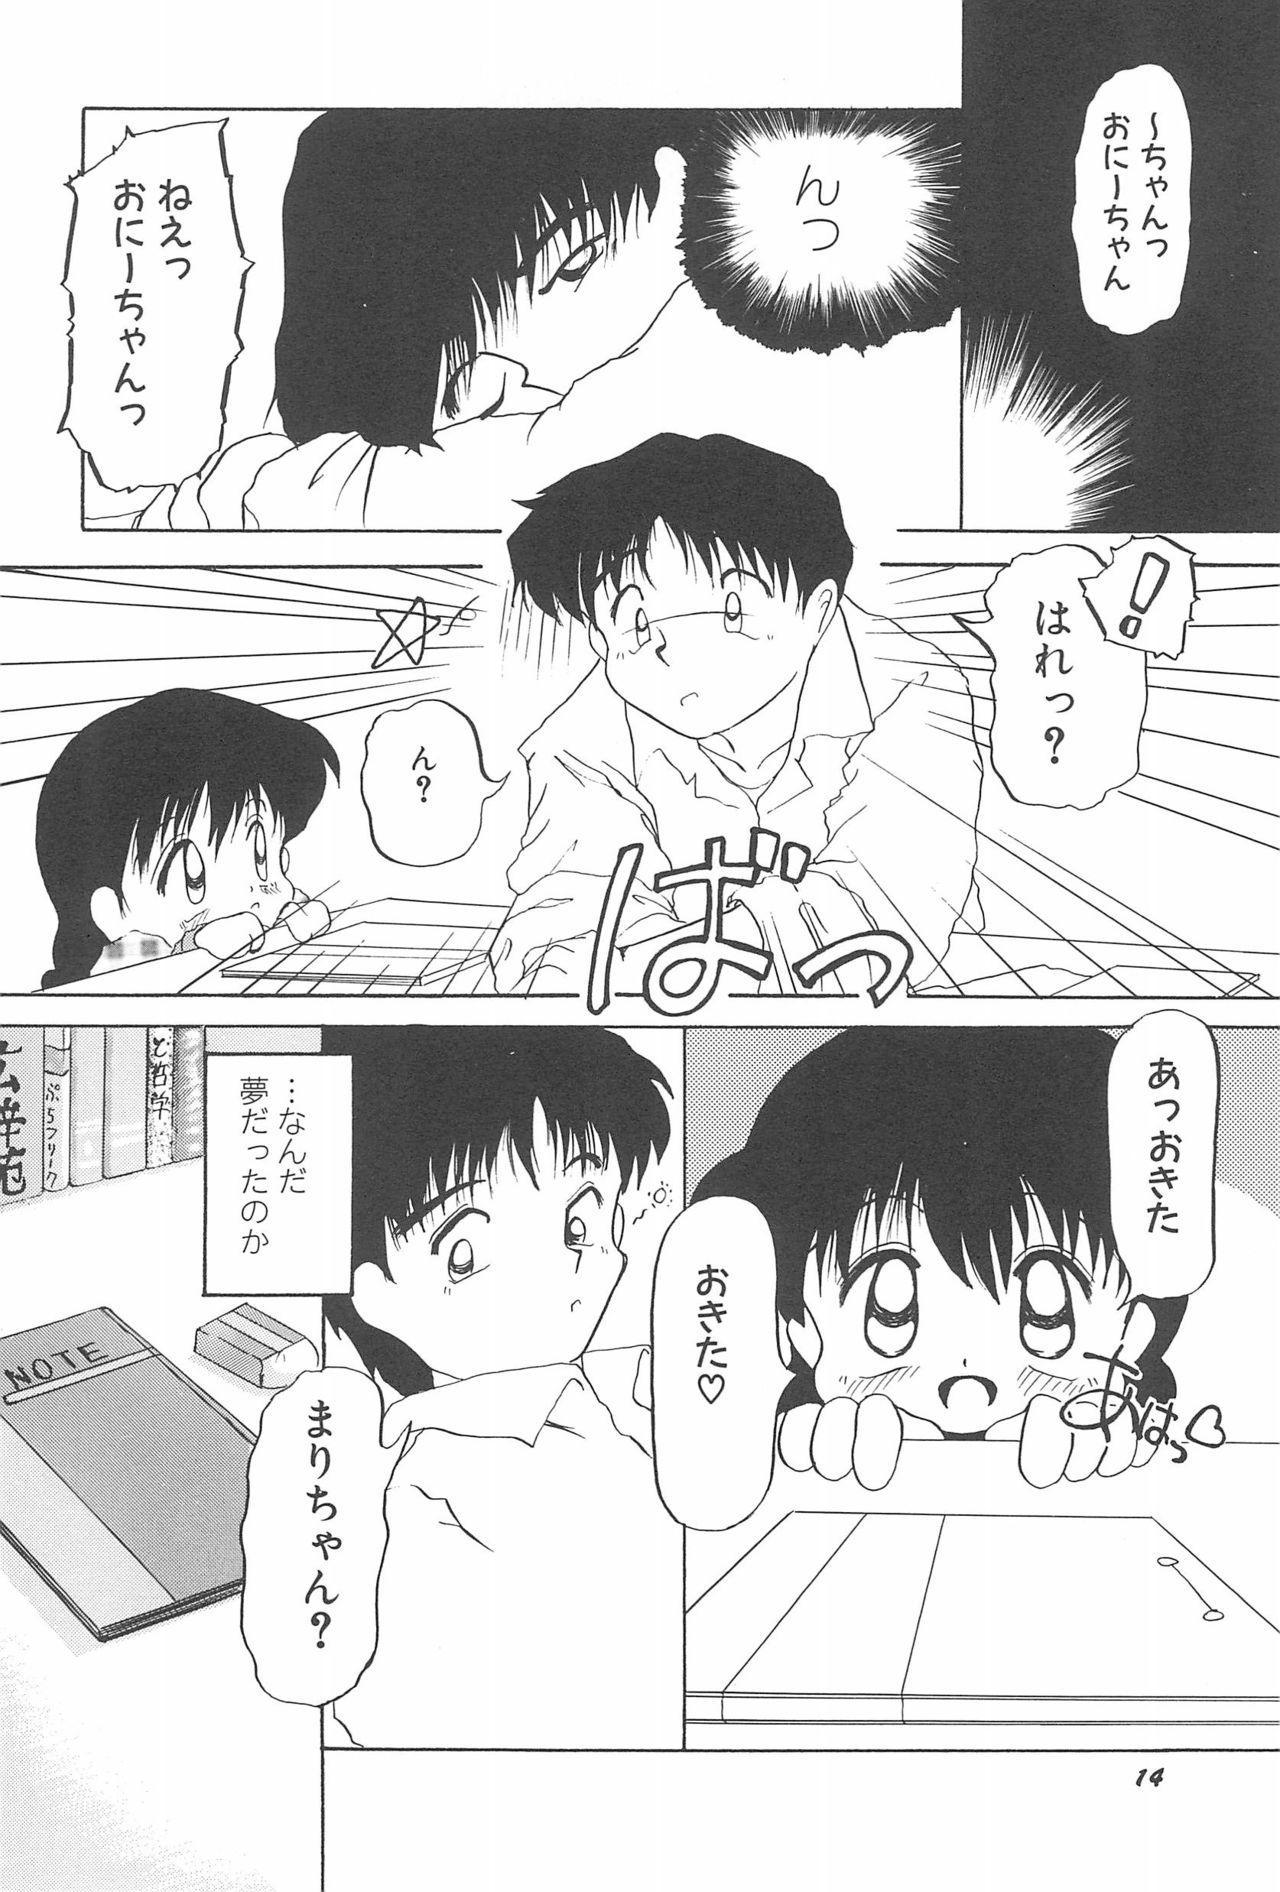 Aoi Shojokyuu 19